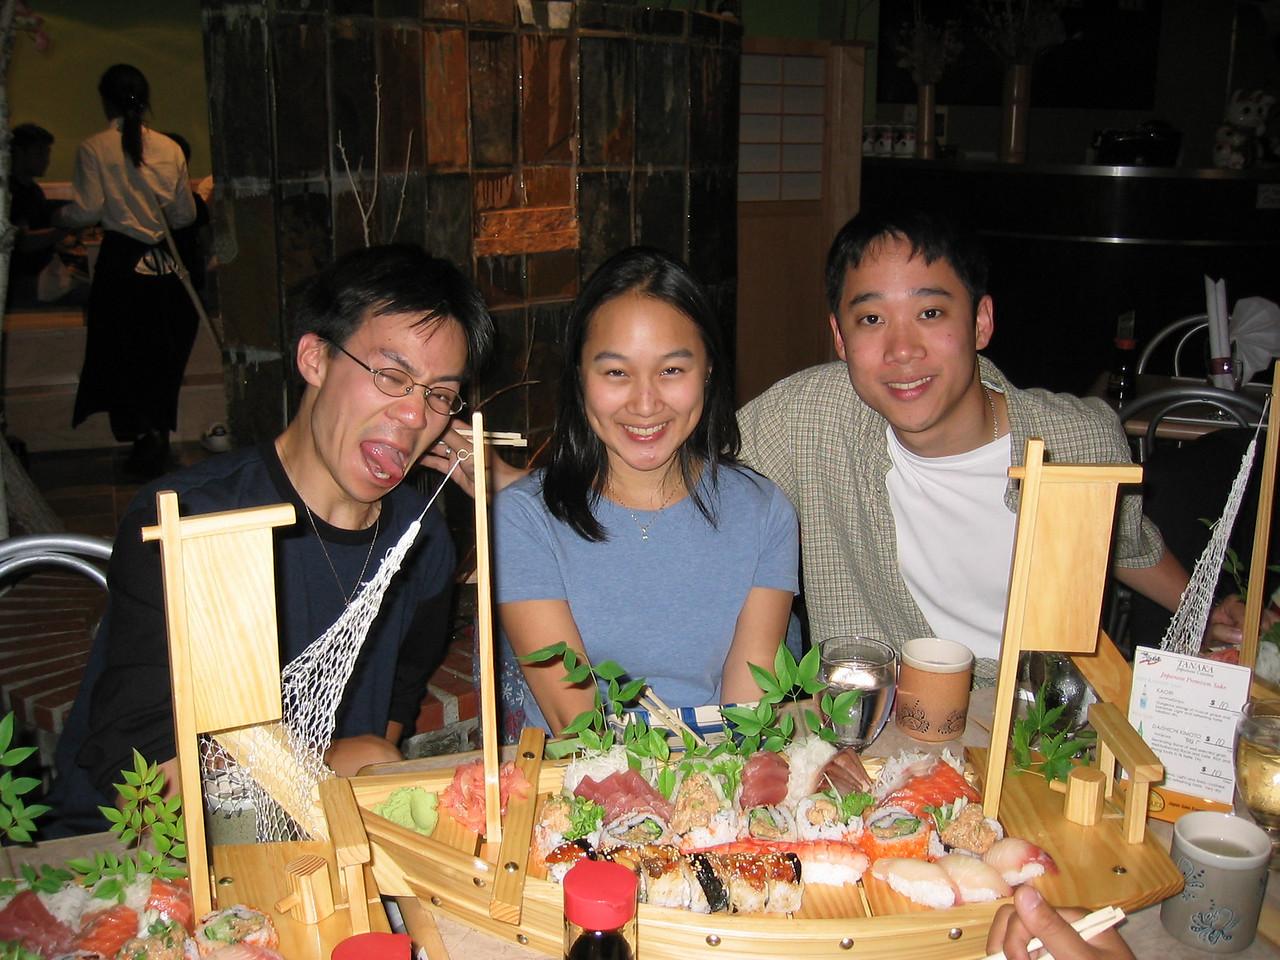 Melissa's welcome back dinner @ Tanaka Sushi - Ben, Melissa, & Andy, Sunday 2003 07 20